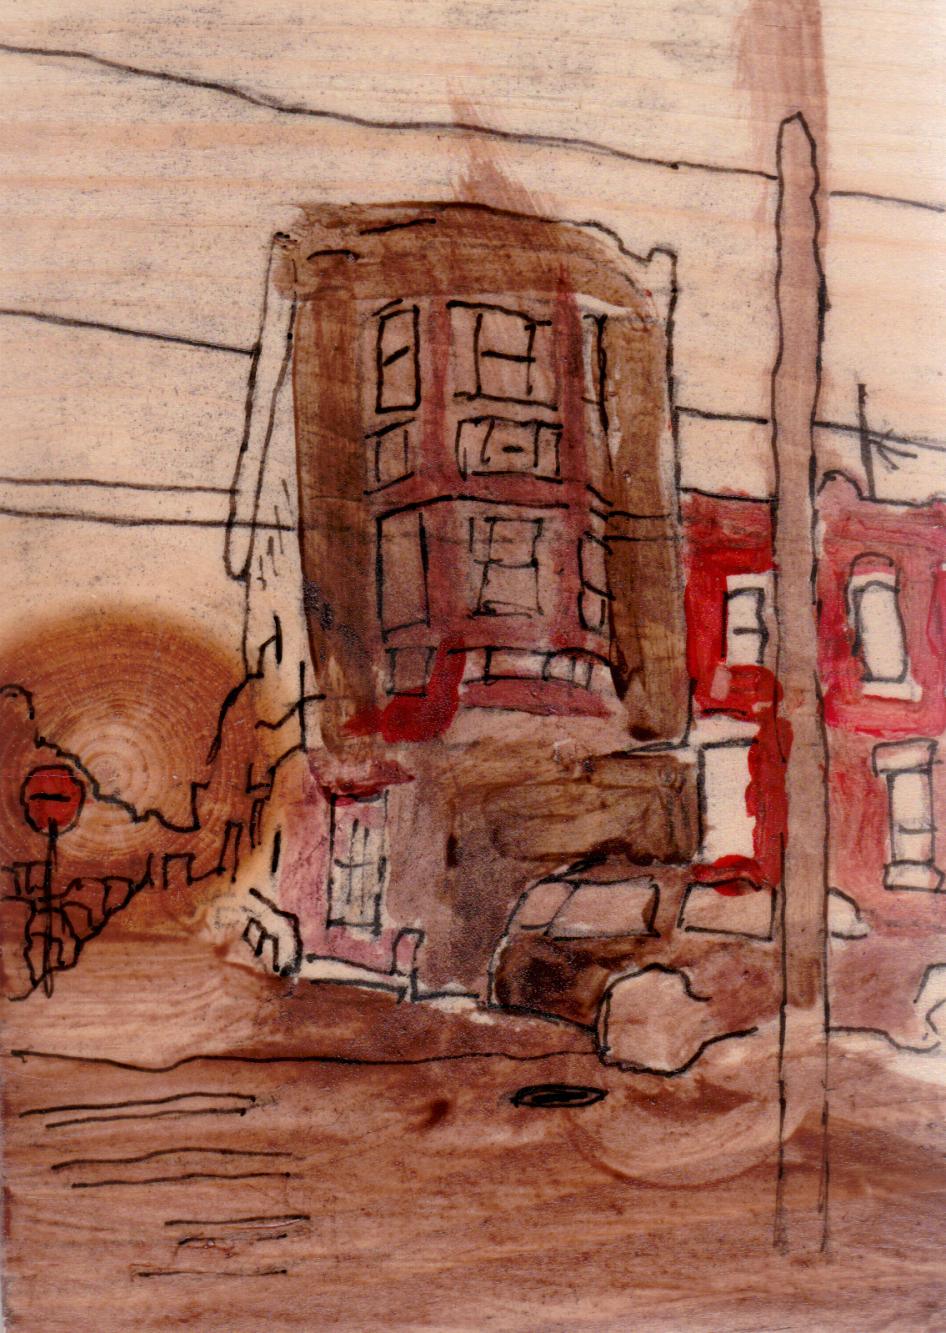 Sawko_cityscape painting_02.jpg